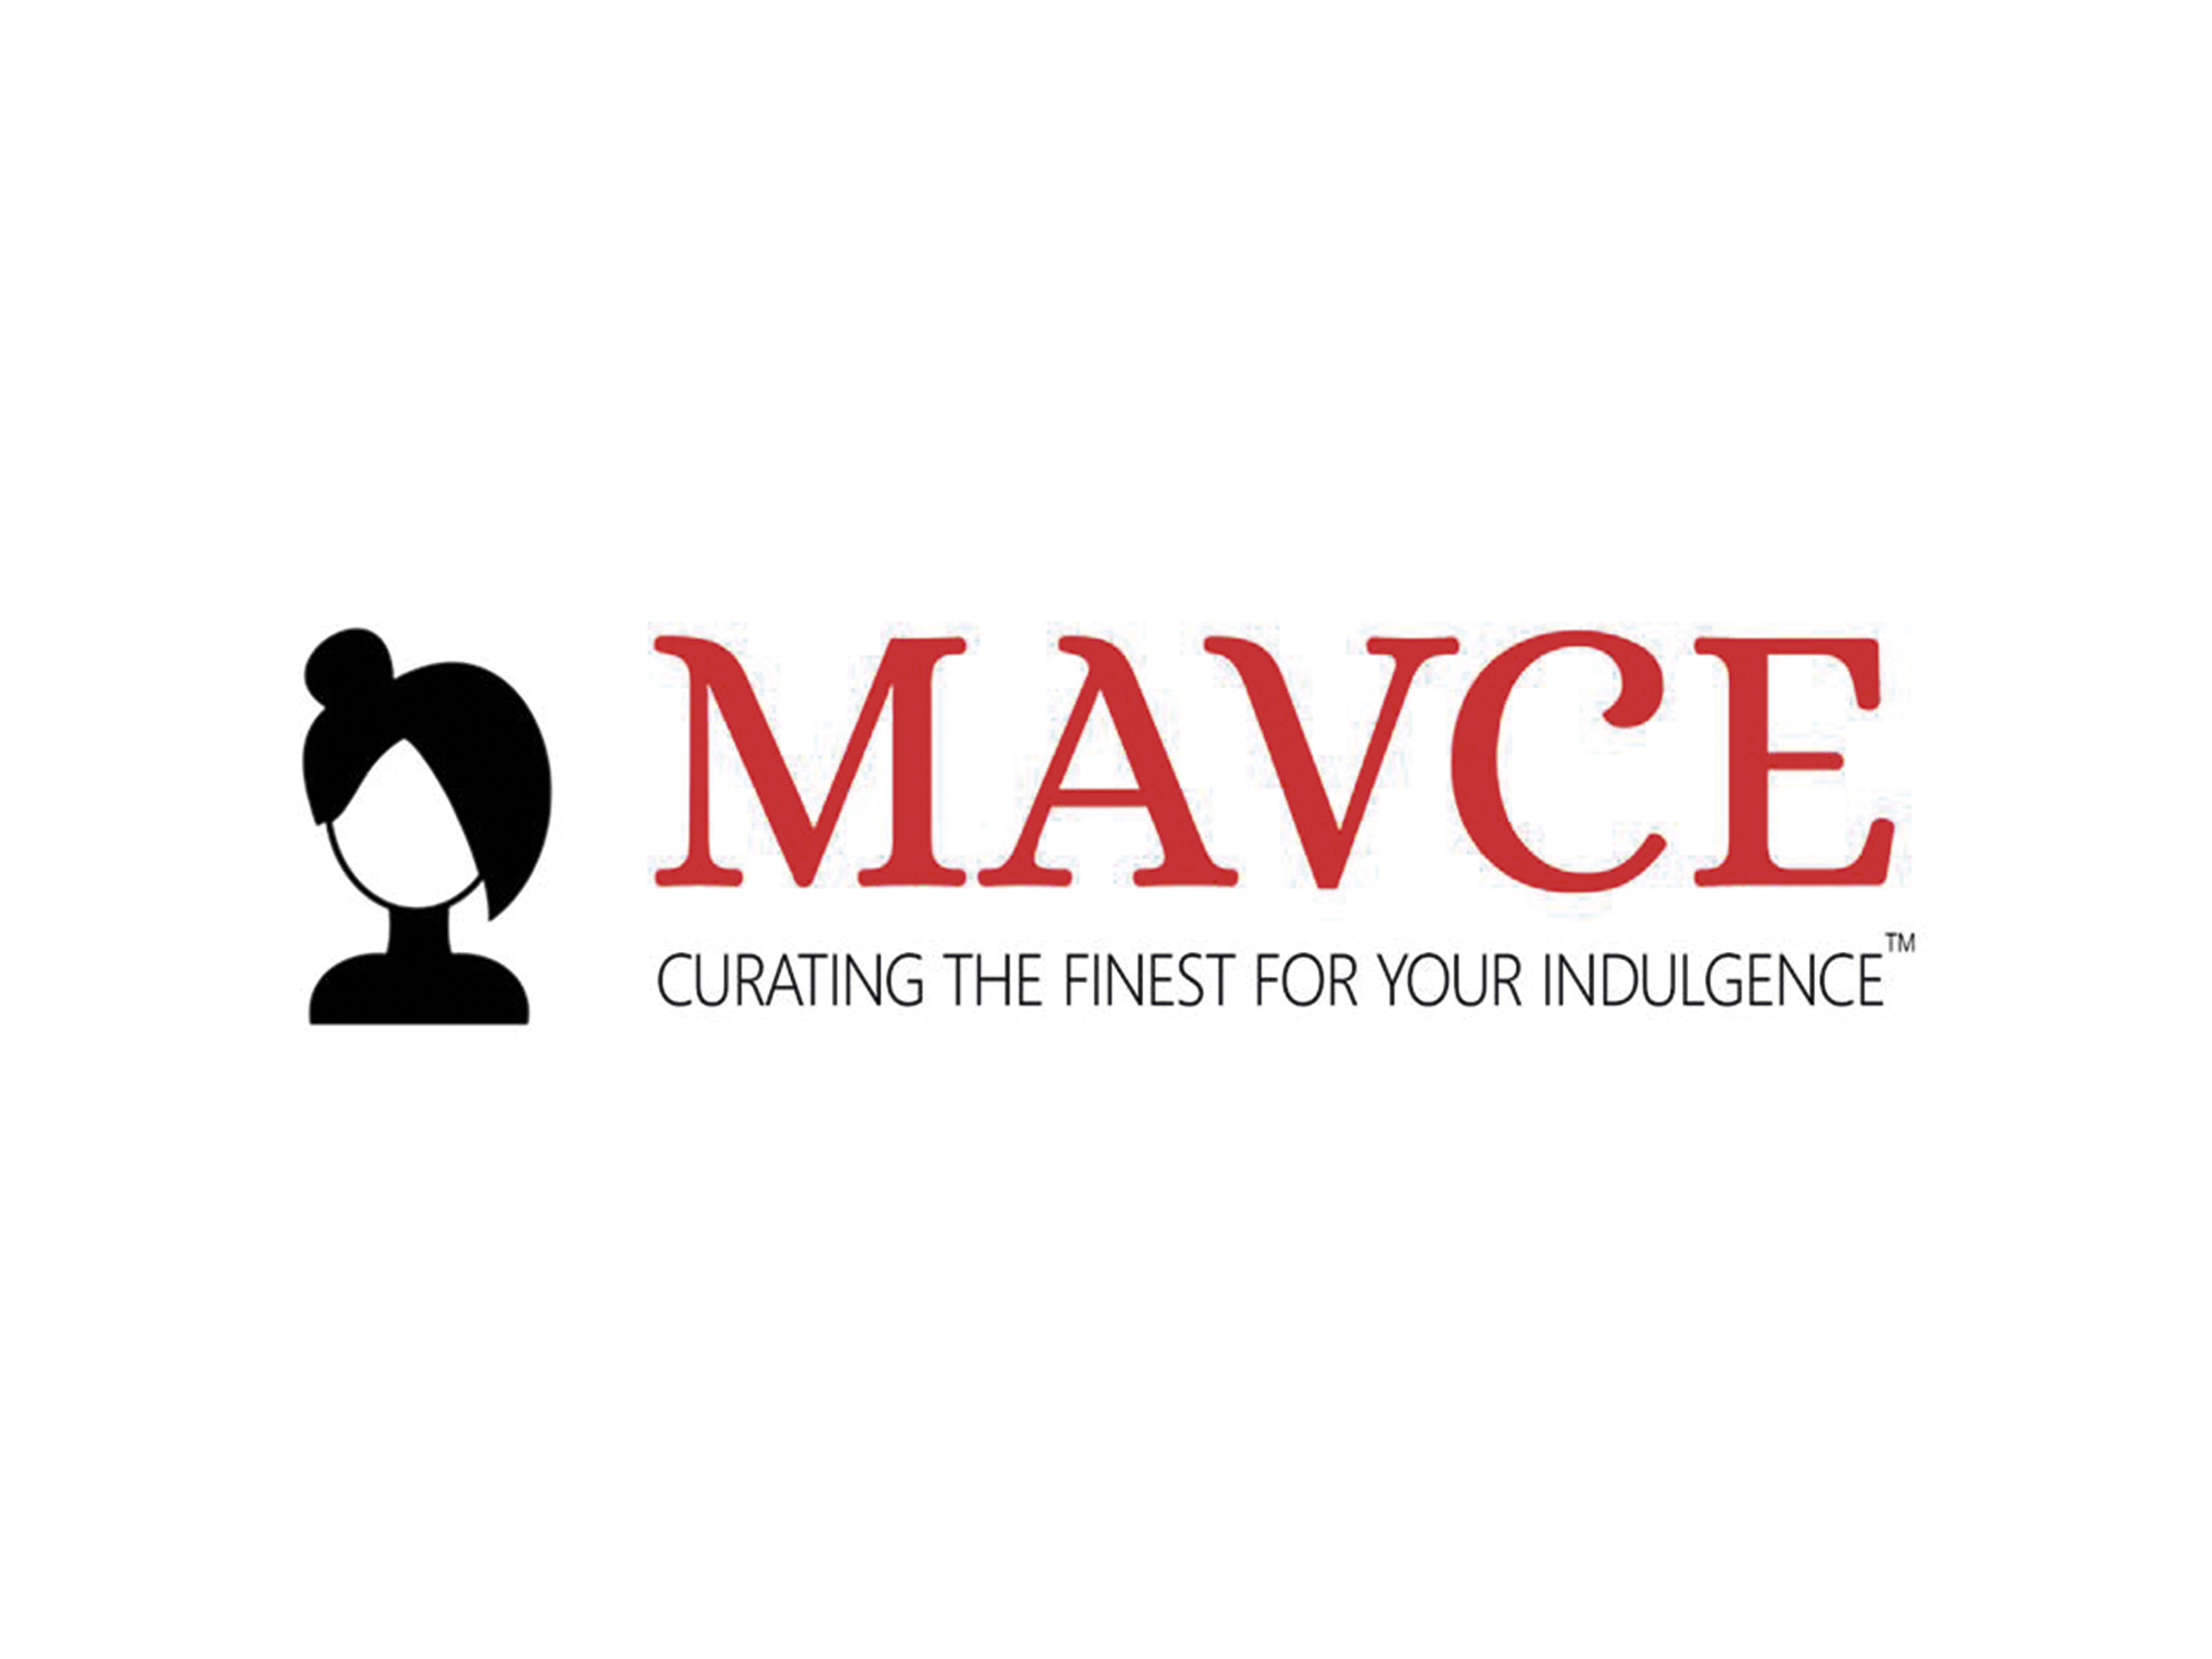 MAVCE